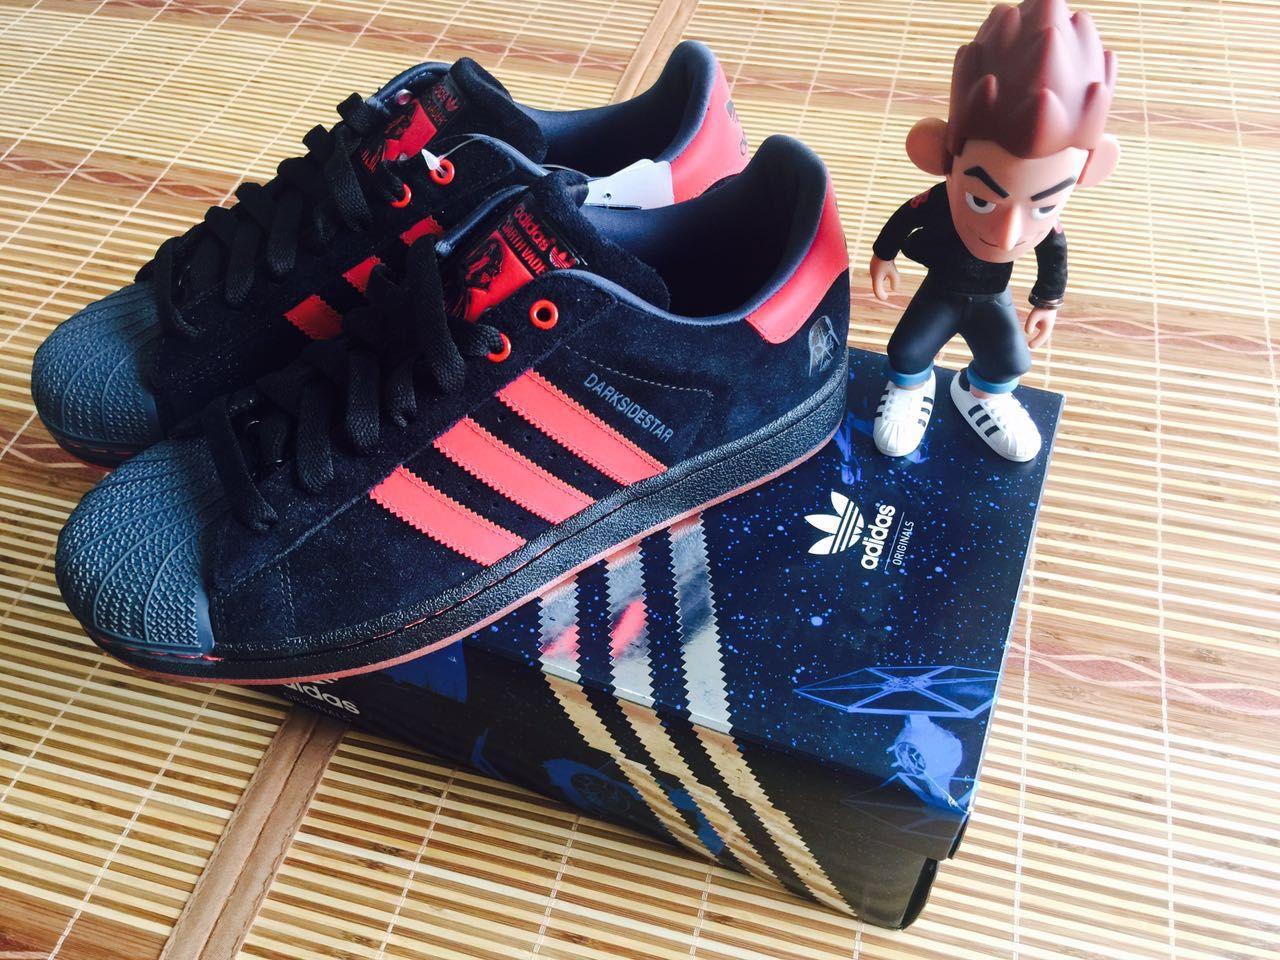 adidas originali coagulo star wars rosso - nero g17150 150 adidas